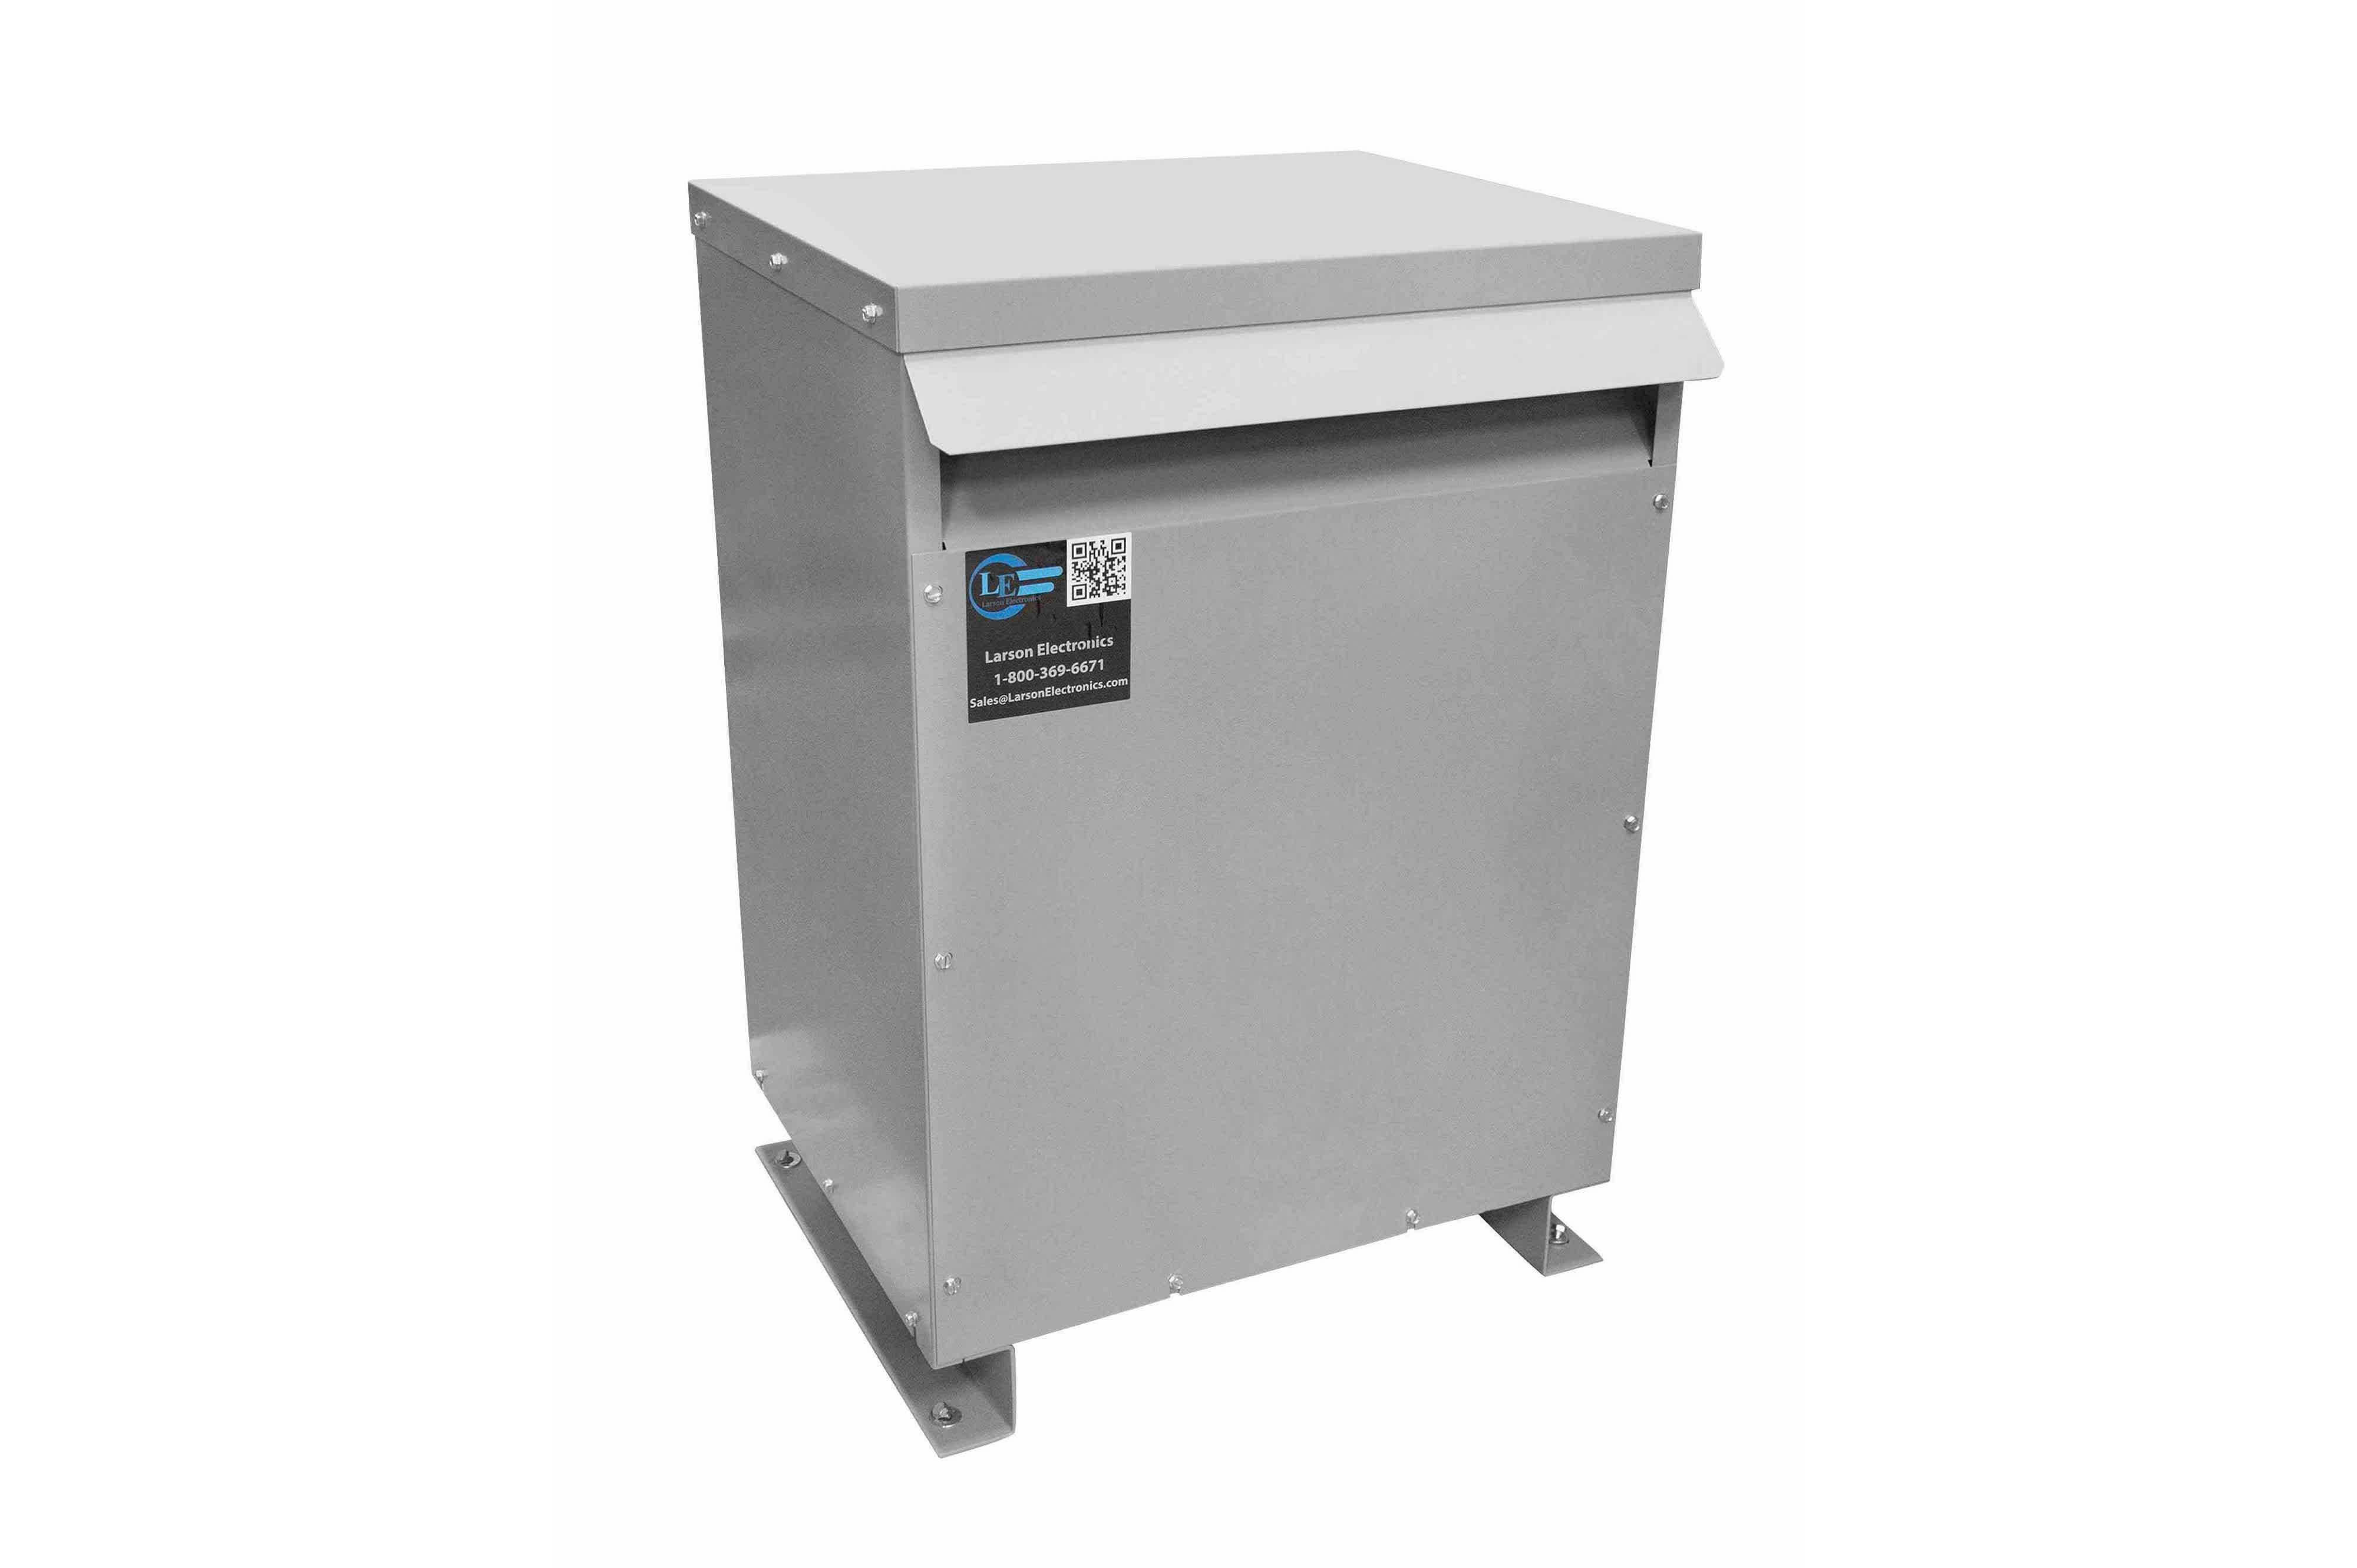 38 kVA 3PH Isolation Transformer, 600V Wye Primary, 208V Delta Secondary, N3R, Ventilated, 60 Hz